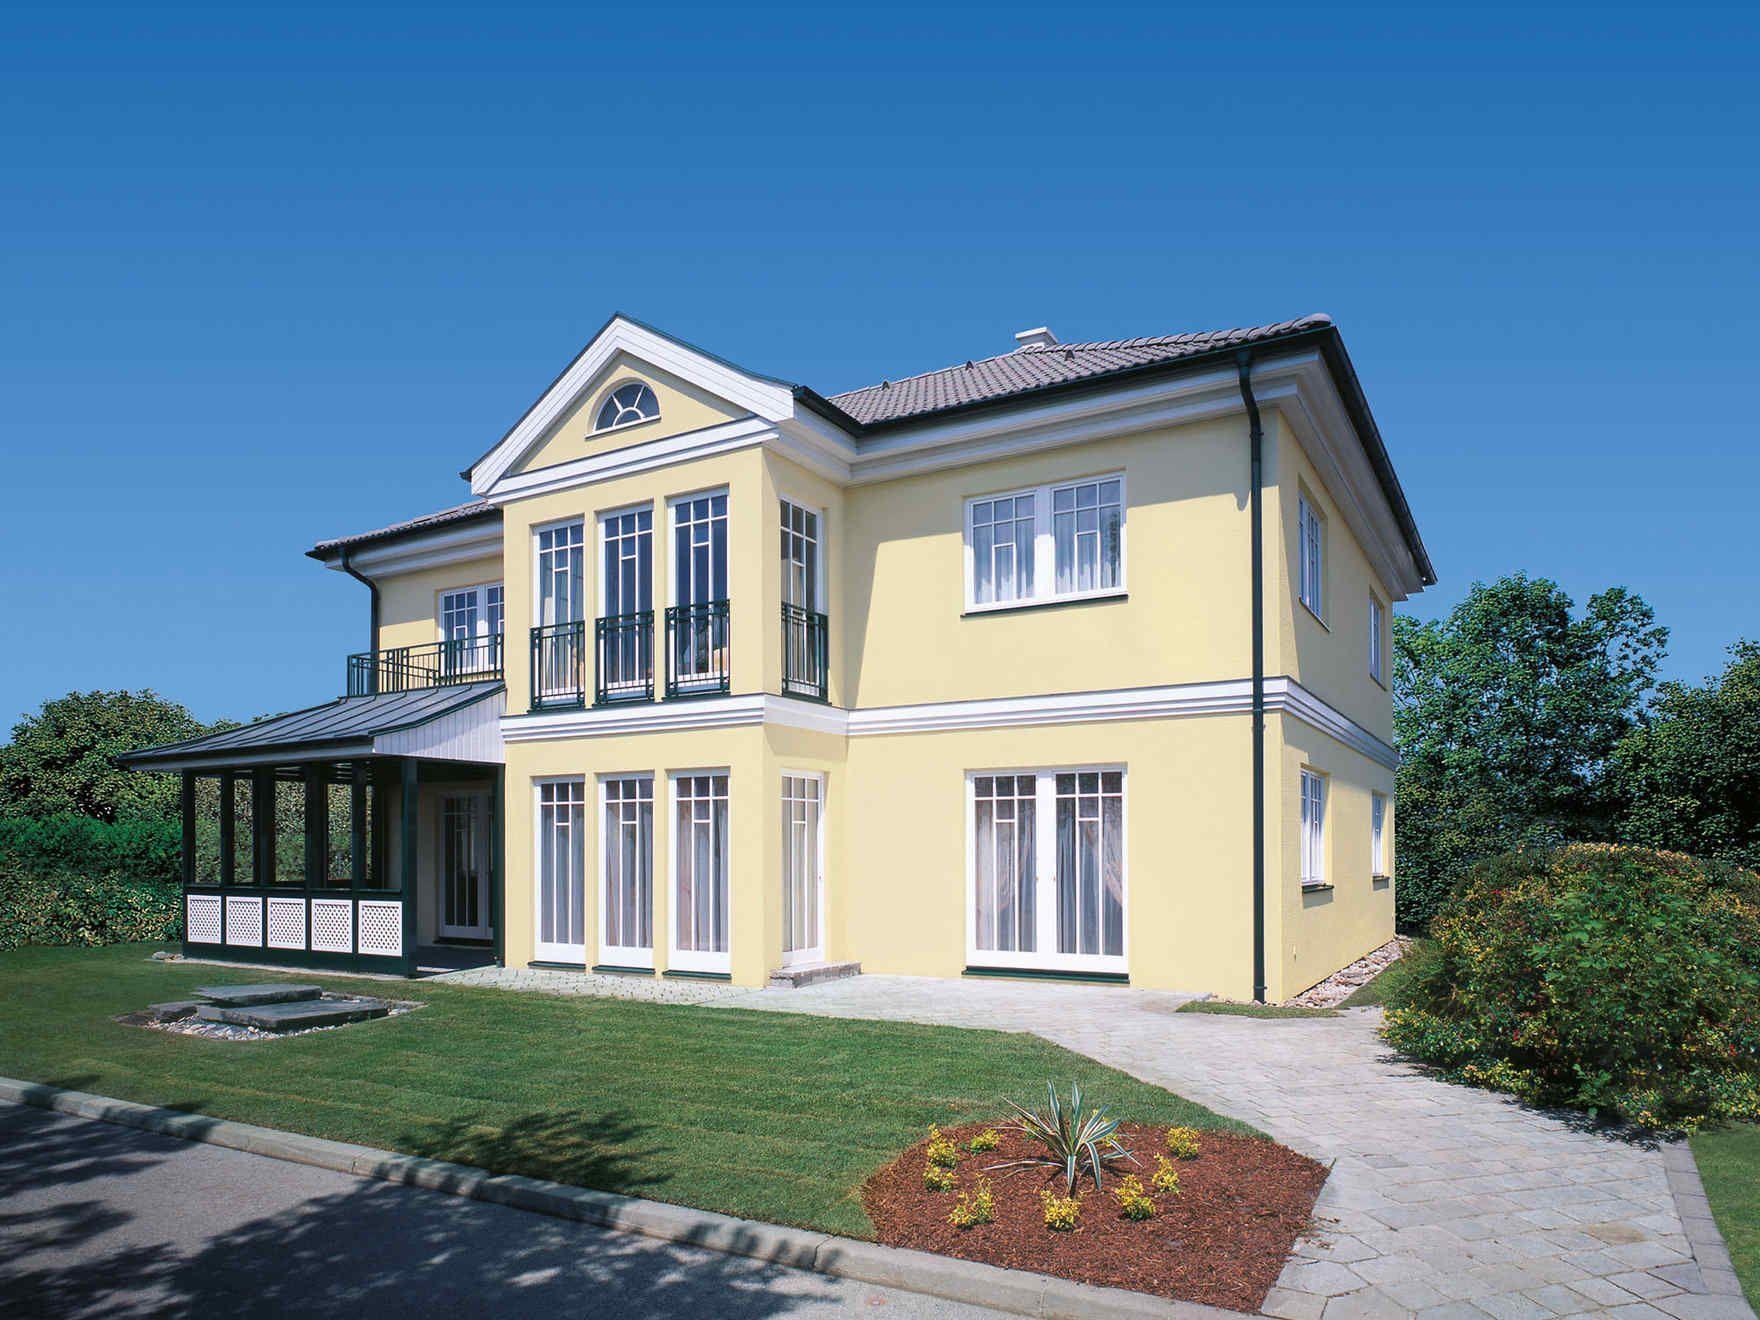 Vario haus architects herrenhaus tara s240 for Klassisches haus bauen